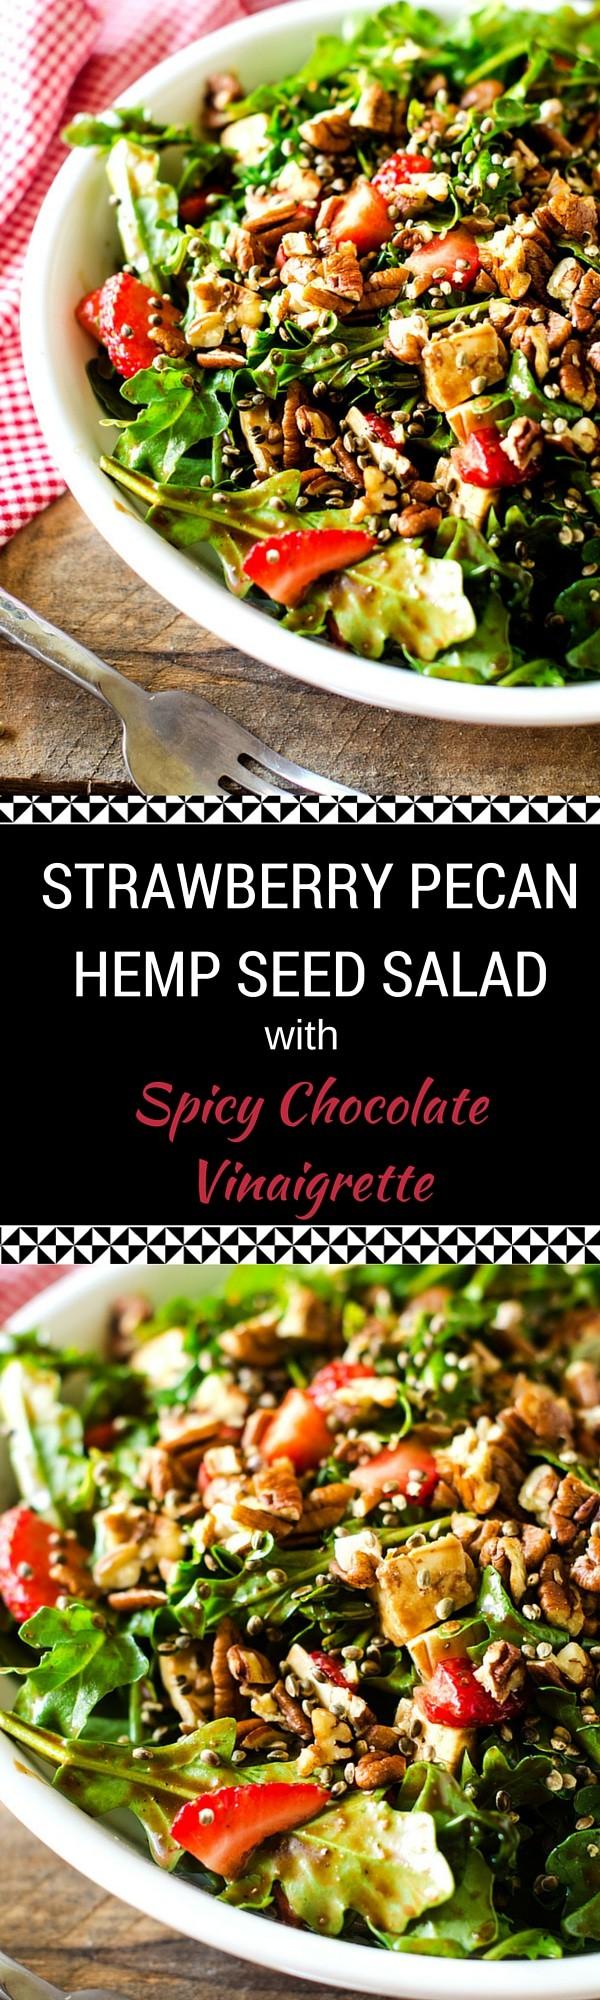 Strawberry Pecan Hemp Seed Salad with Spicy Chocolate Vinaigrette - WendyPolisi.com